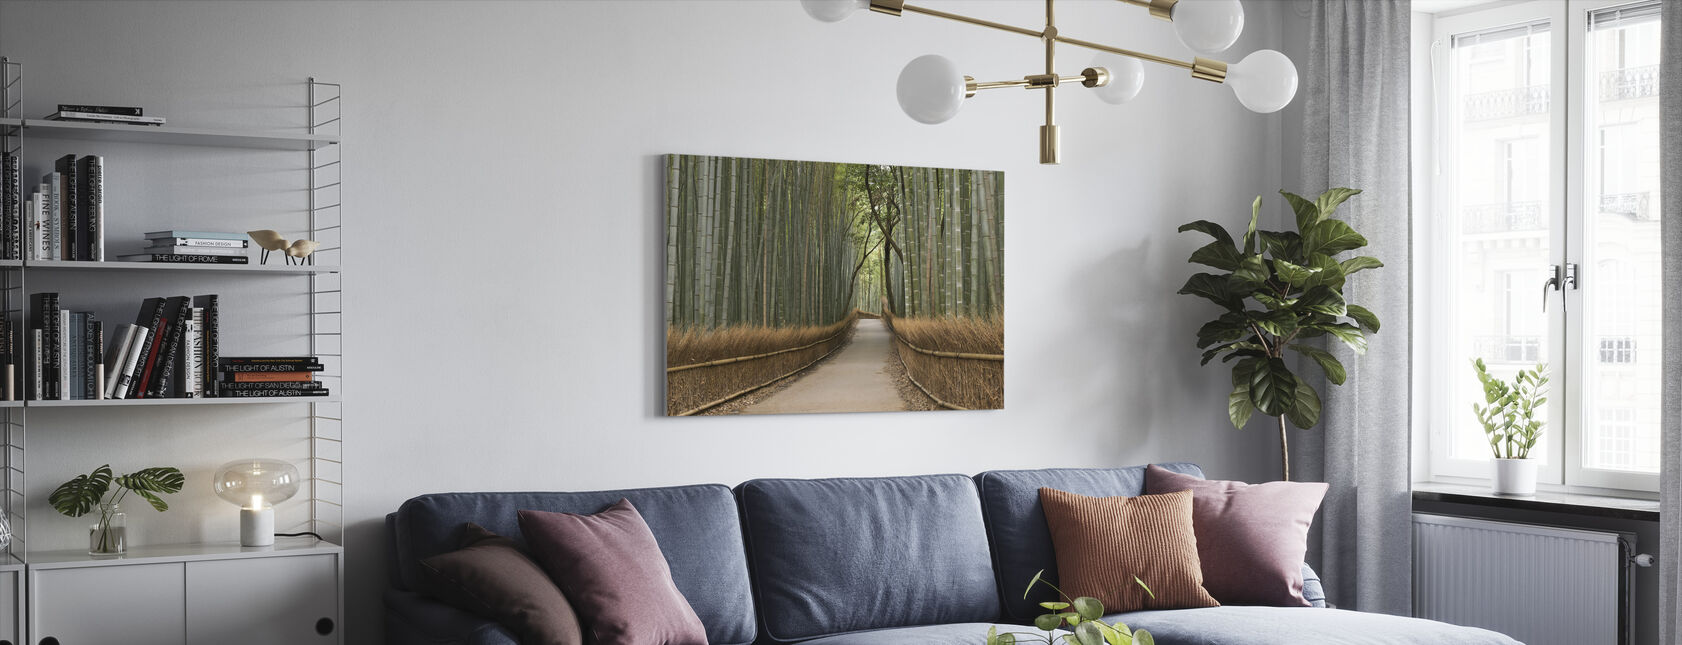 Tenryu-ji Temple Passage - Canvas print - Living Room